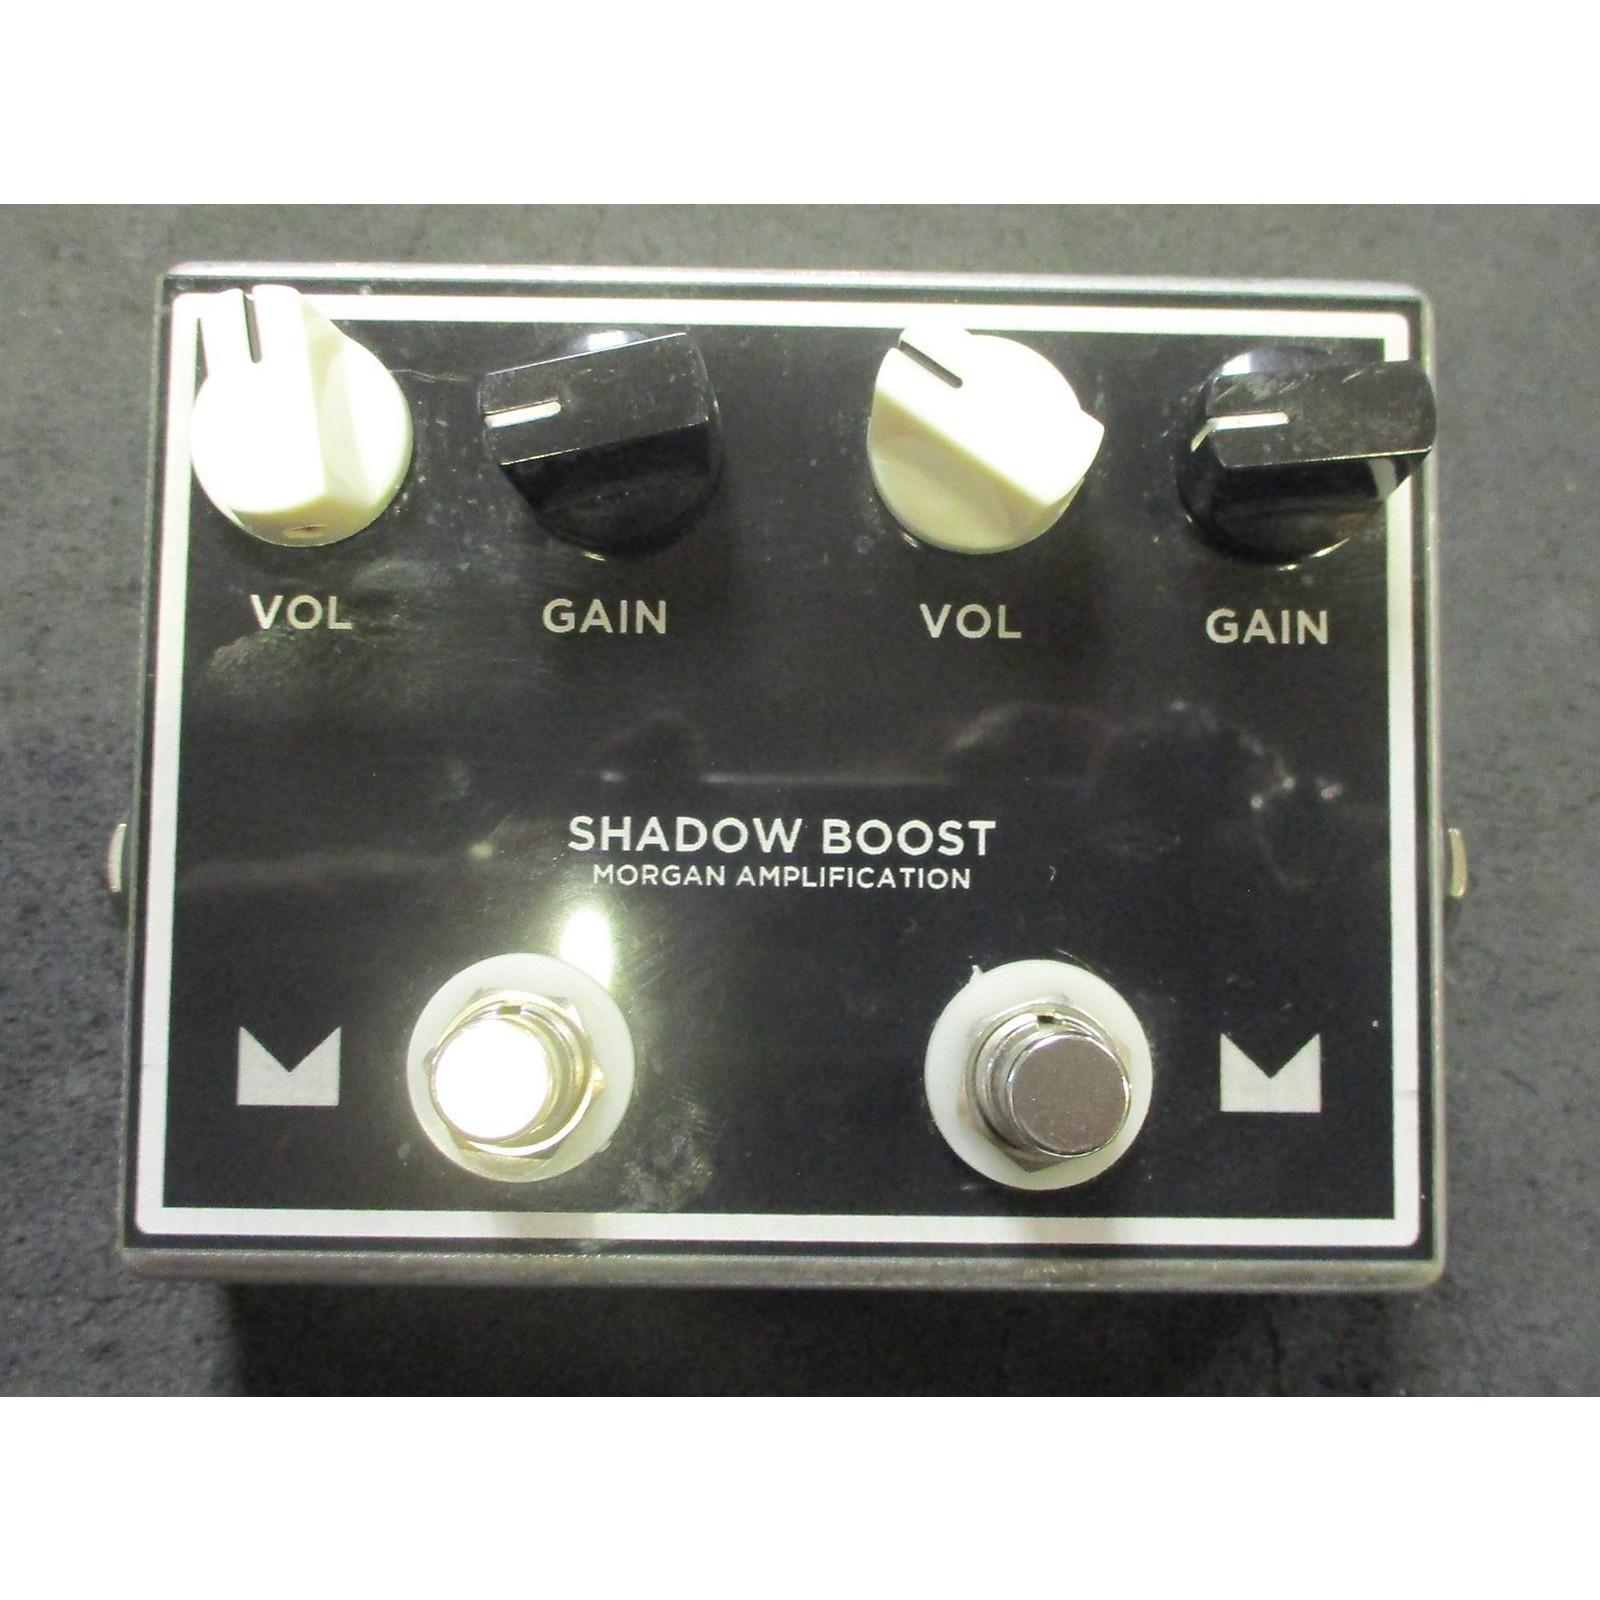 Morgan Amplification SHADOW BOOST Effect Pedal